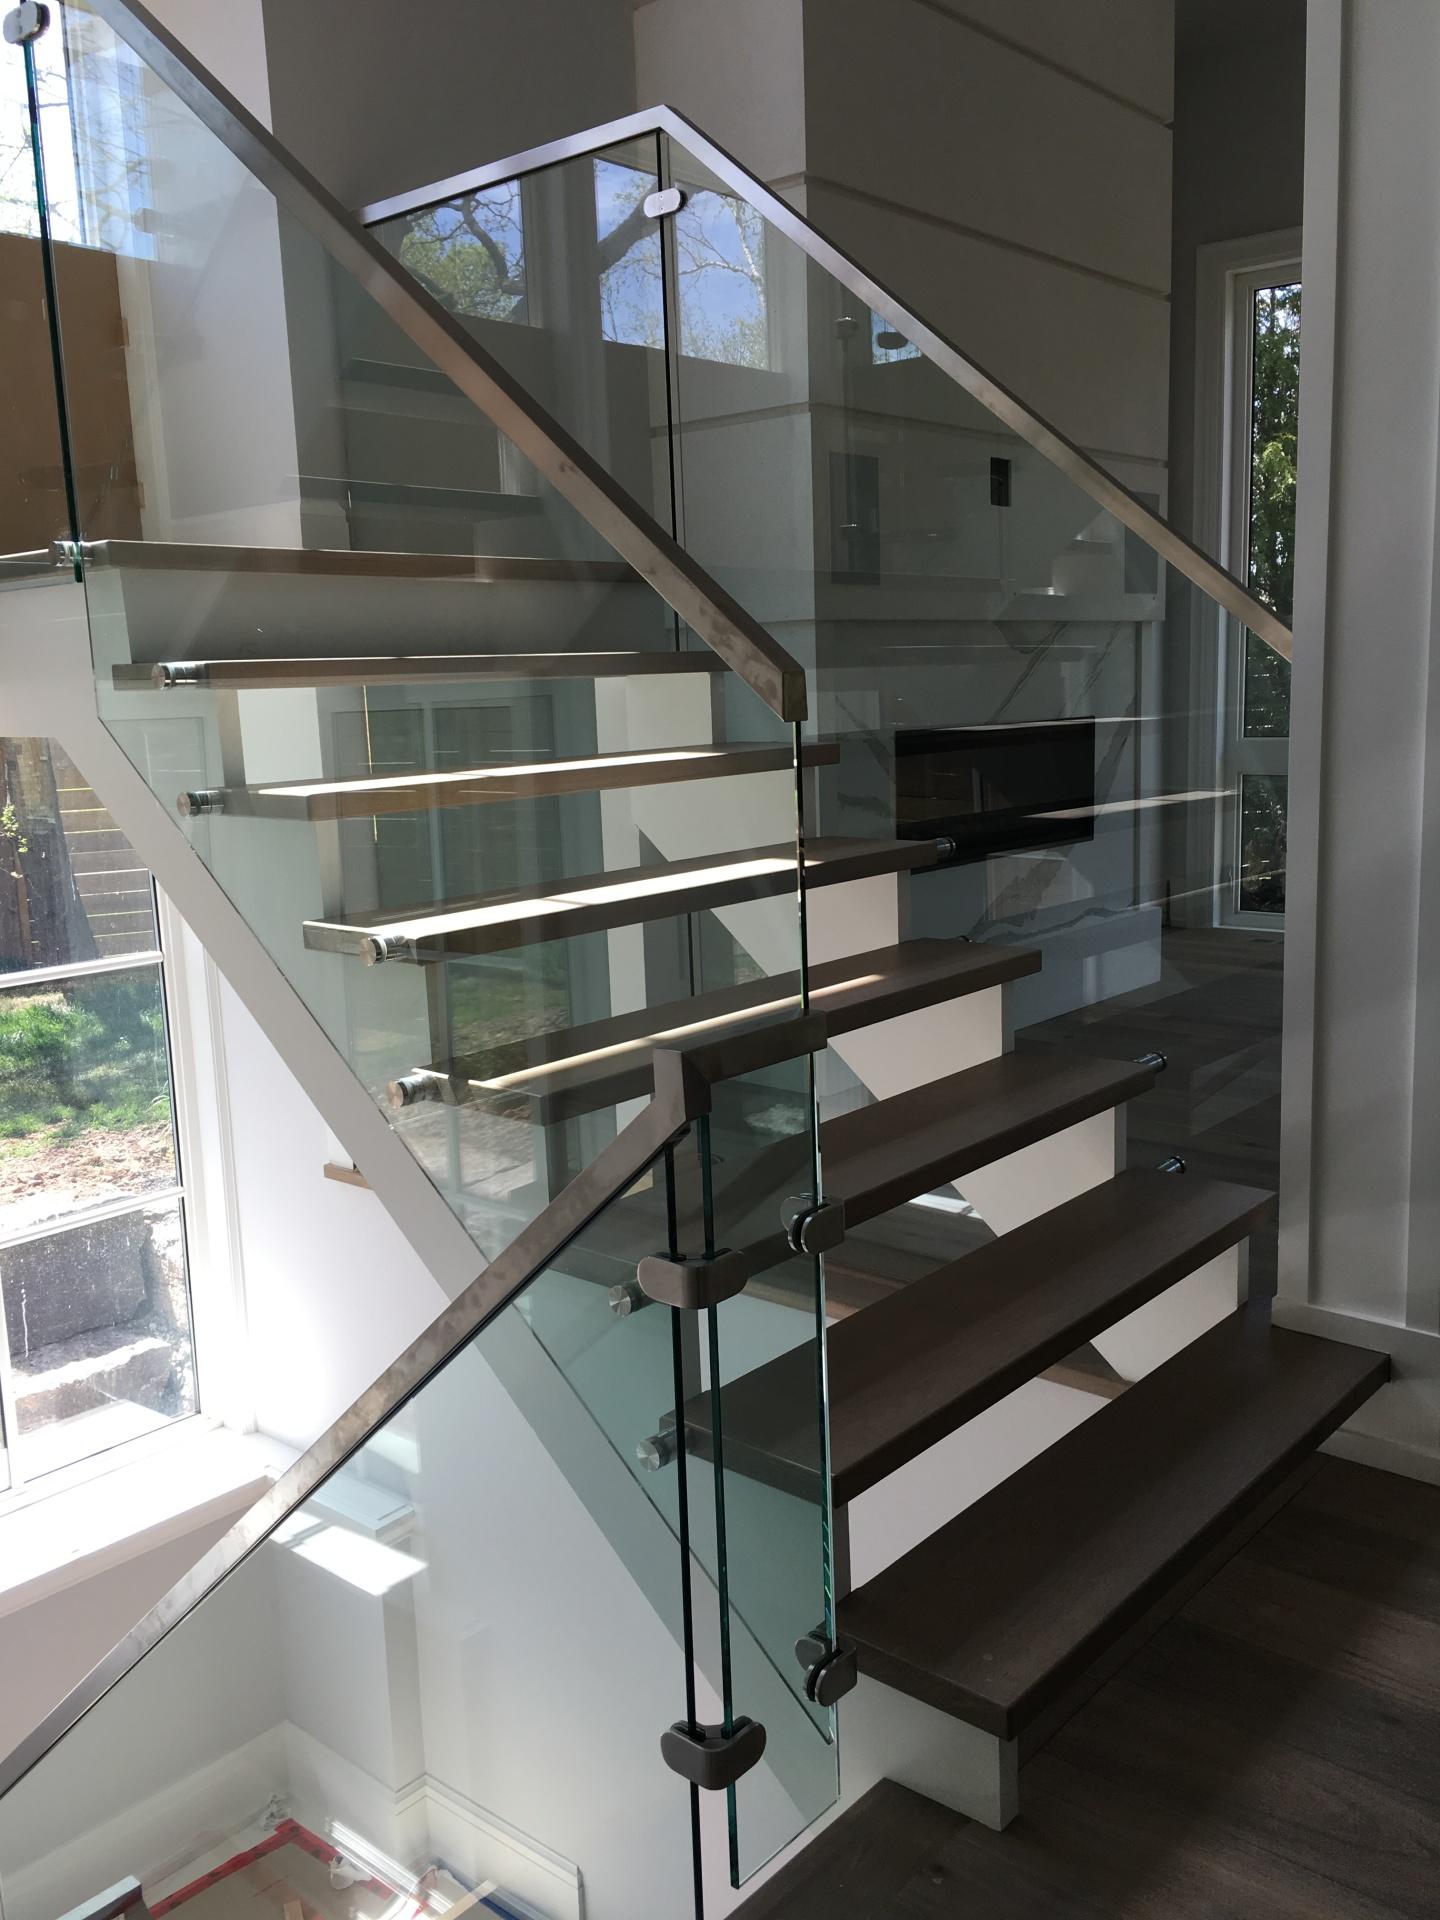 continous handrail